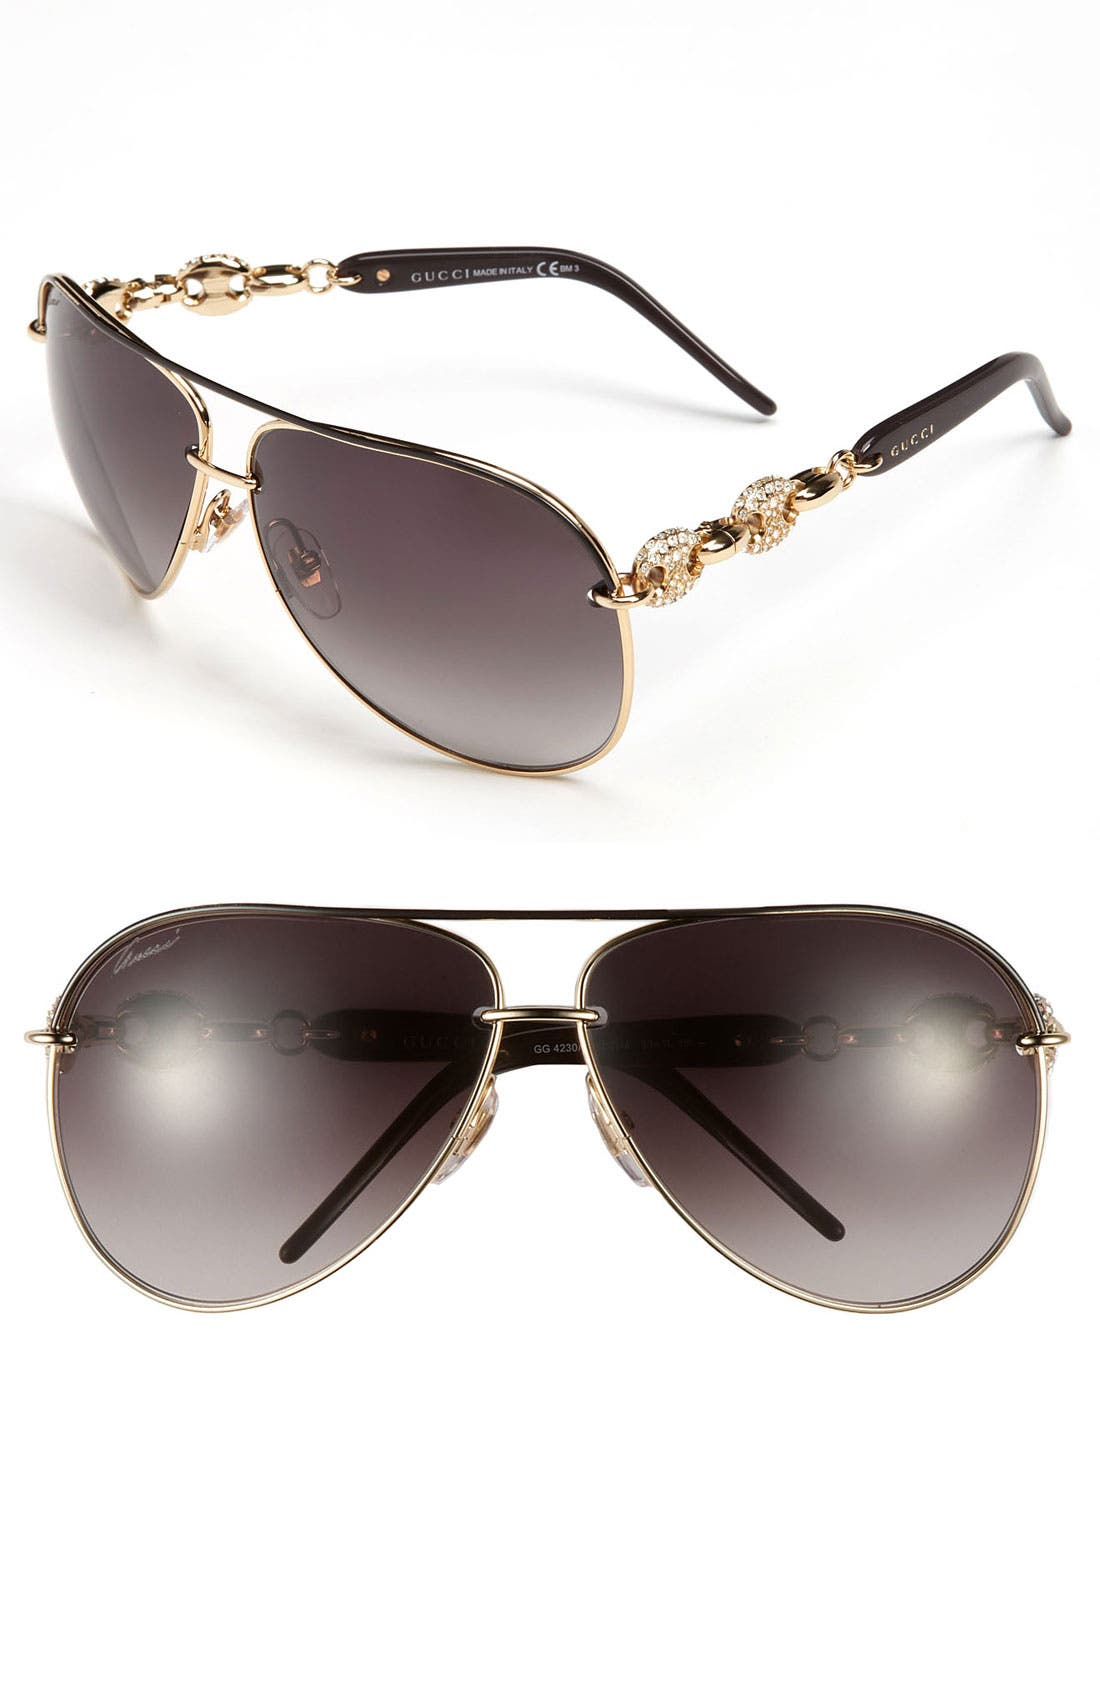 Main Image - Gucci 63mm Embellished Temple Aviator Sunglasses